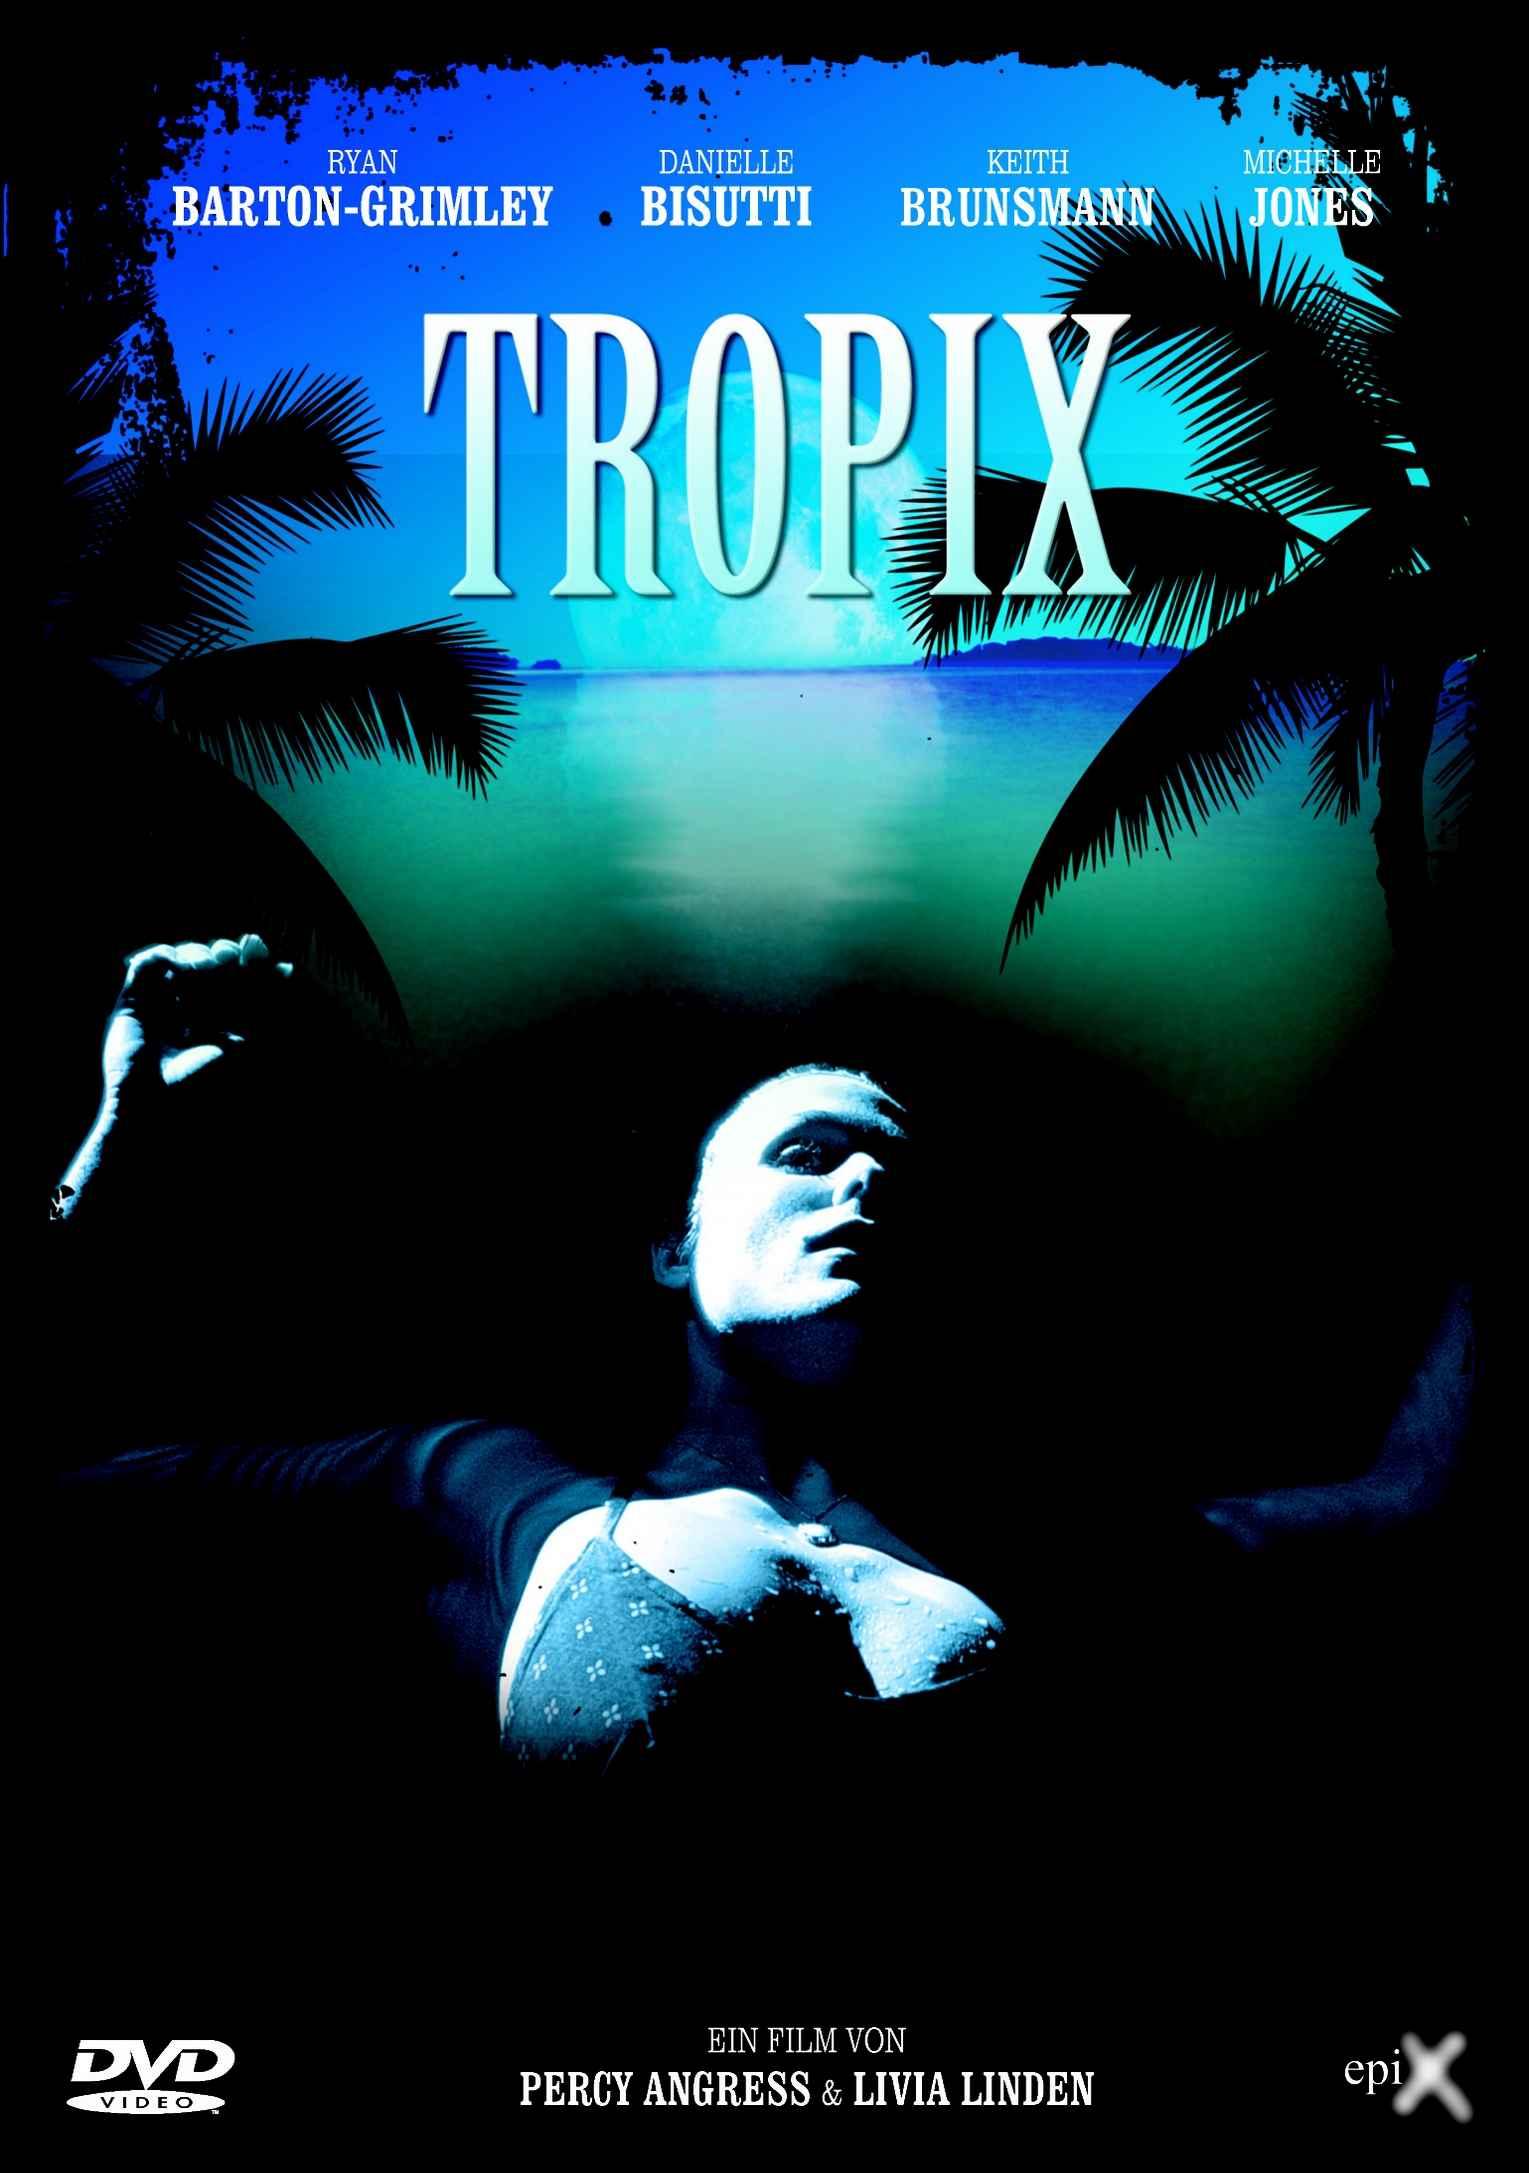 TROPIX Frontcover FINAL.jpg